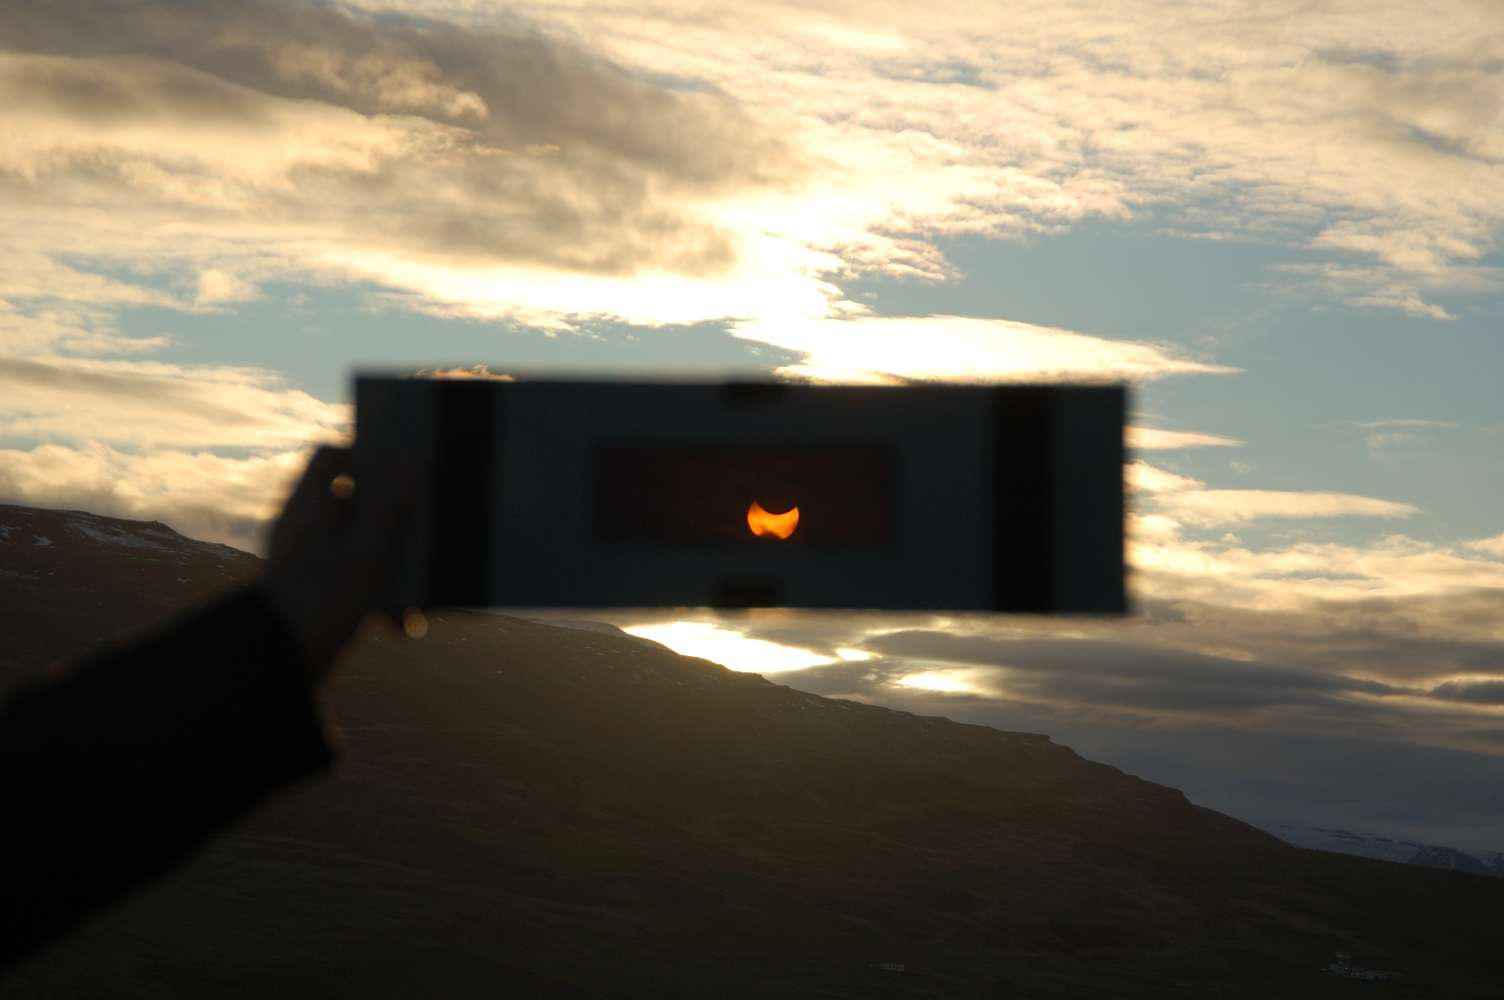 Midnight sun from Iceland